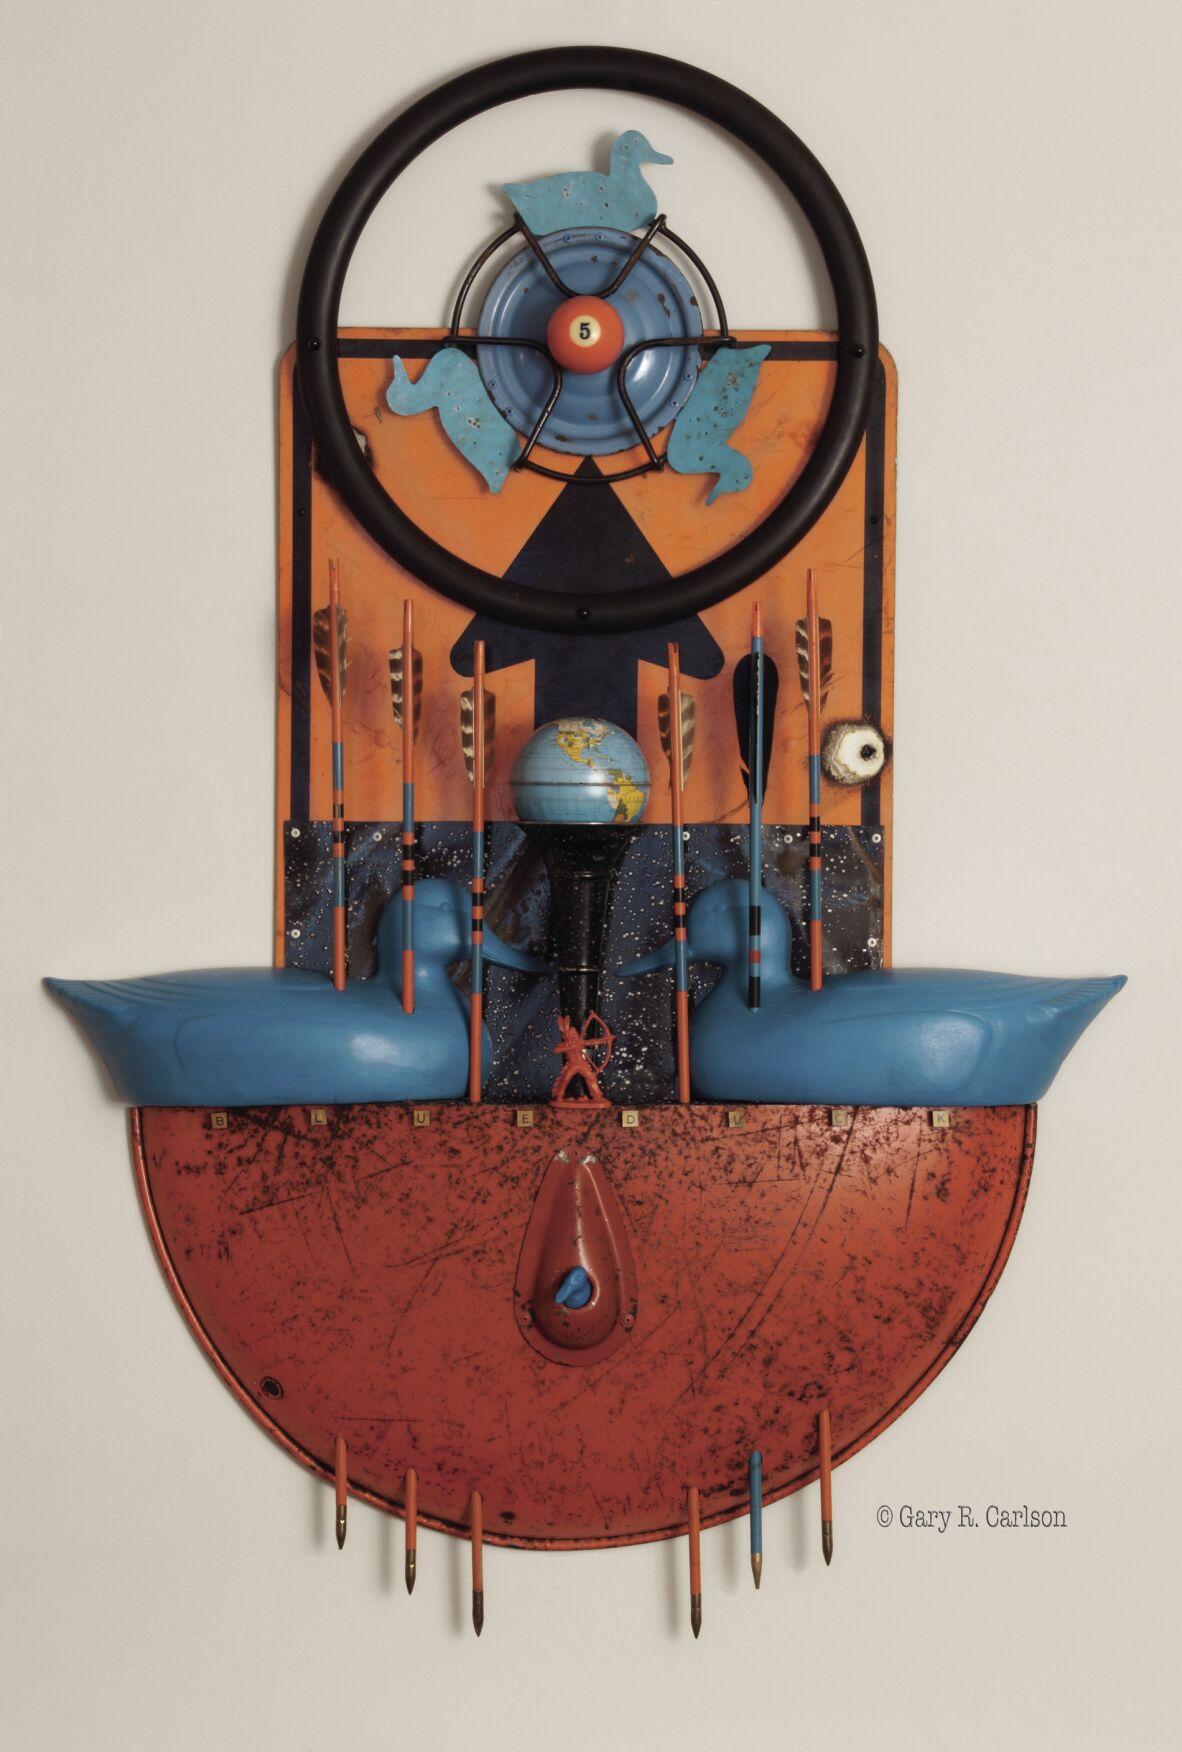 GCarlson-Blue-Duck-Arcade.jpg